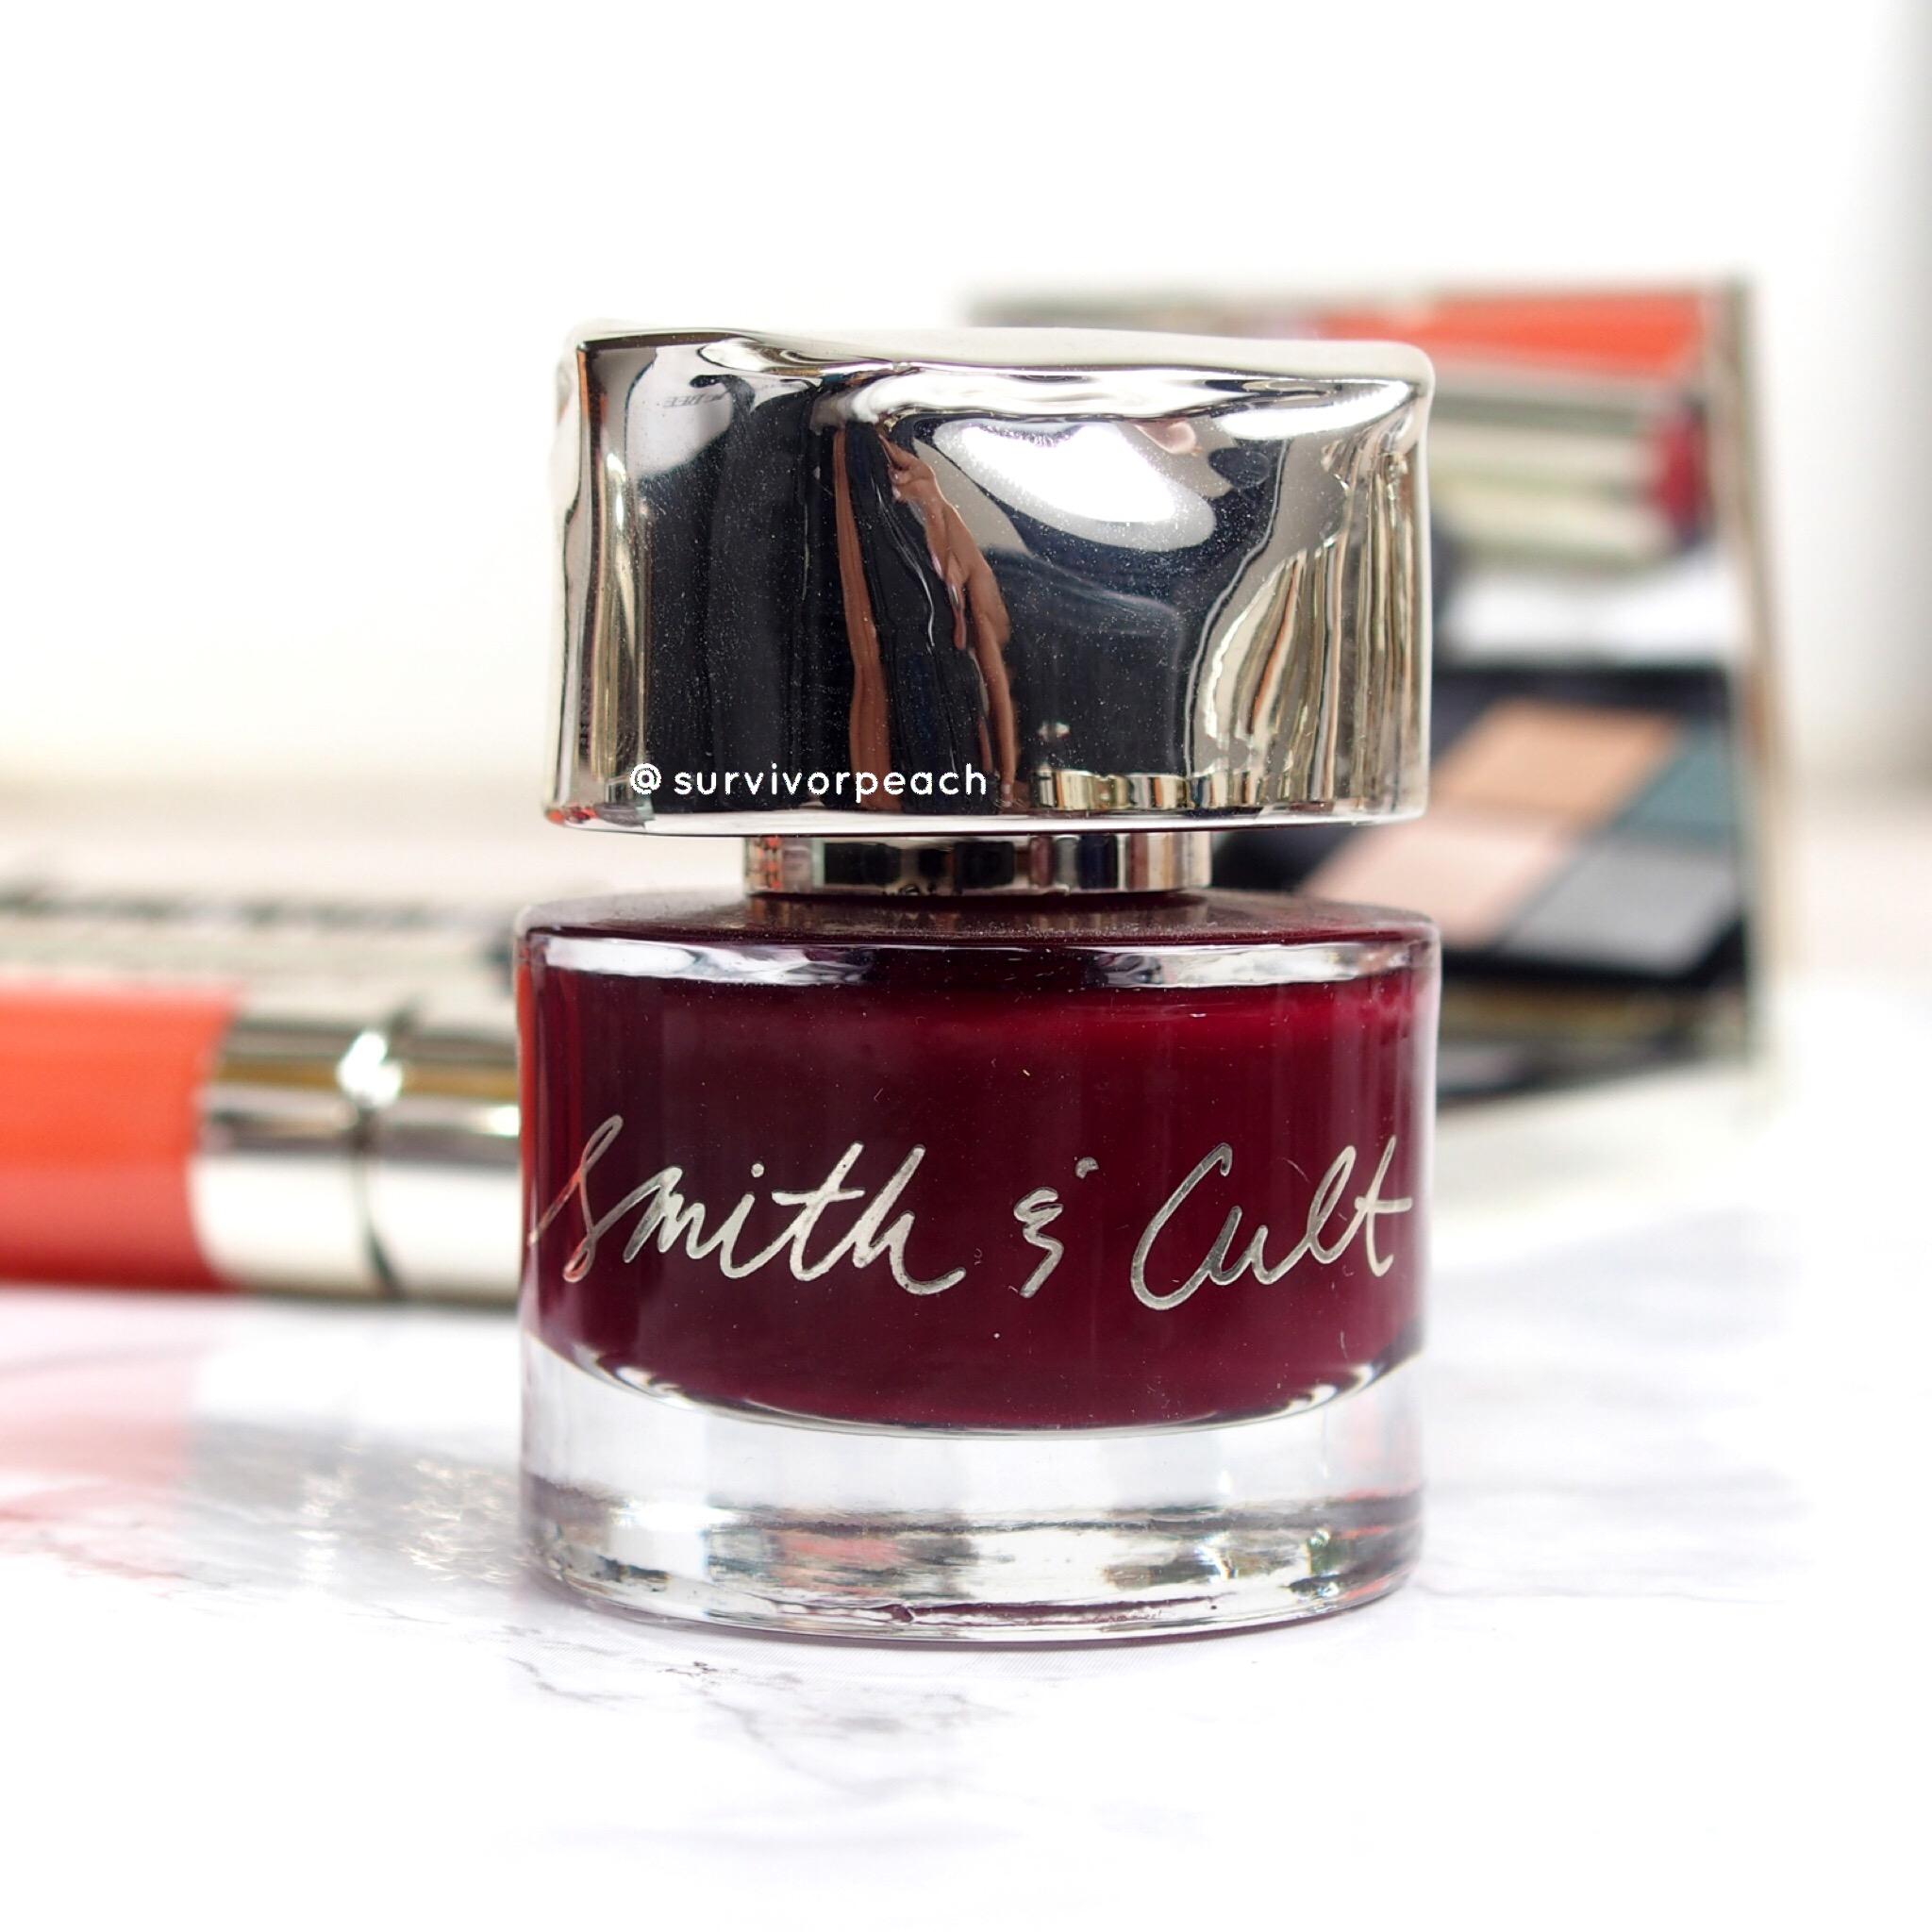 Smith & Cult Nail Polish in Lovers Creep